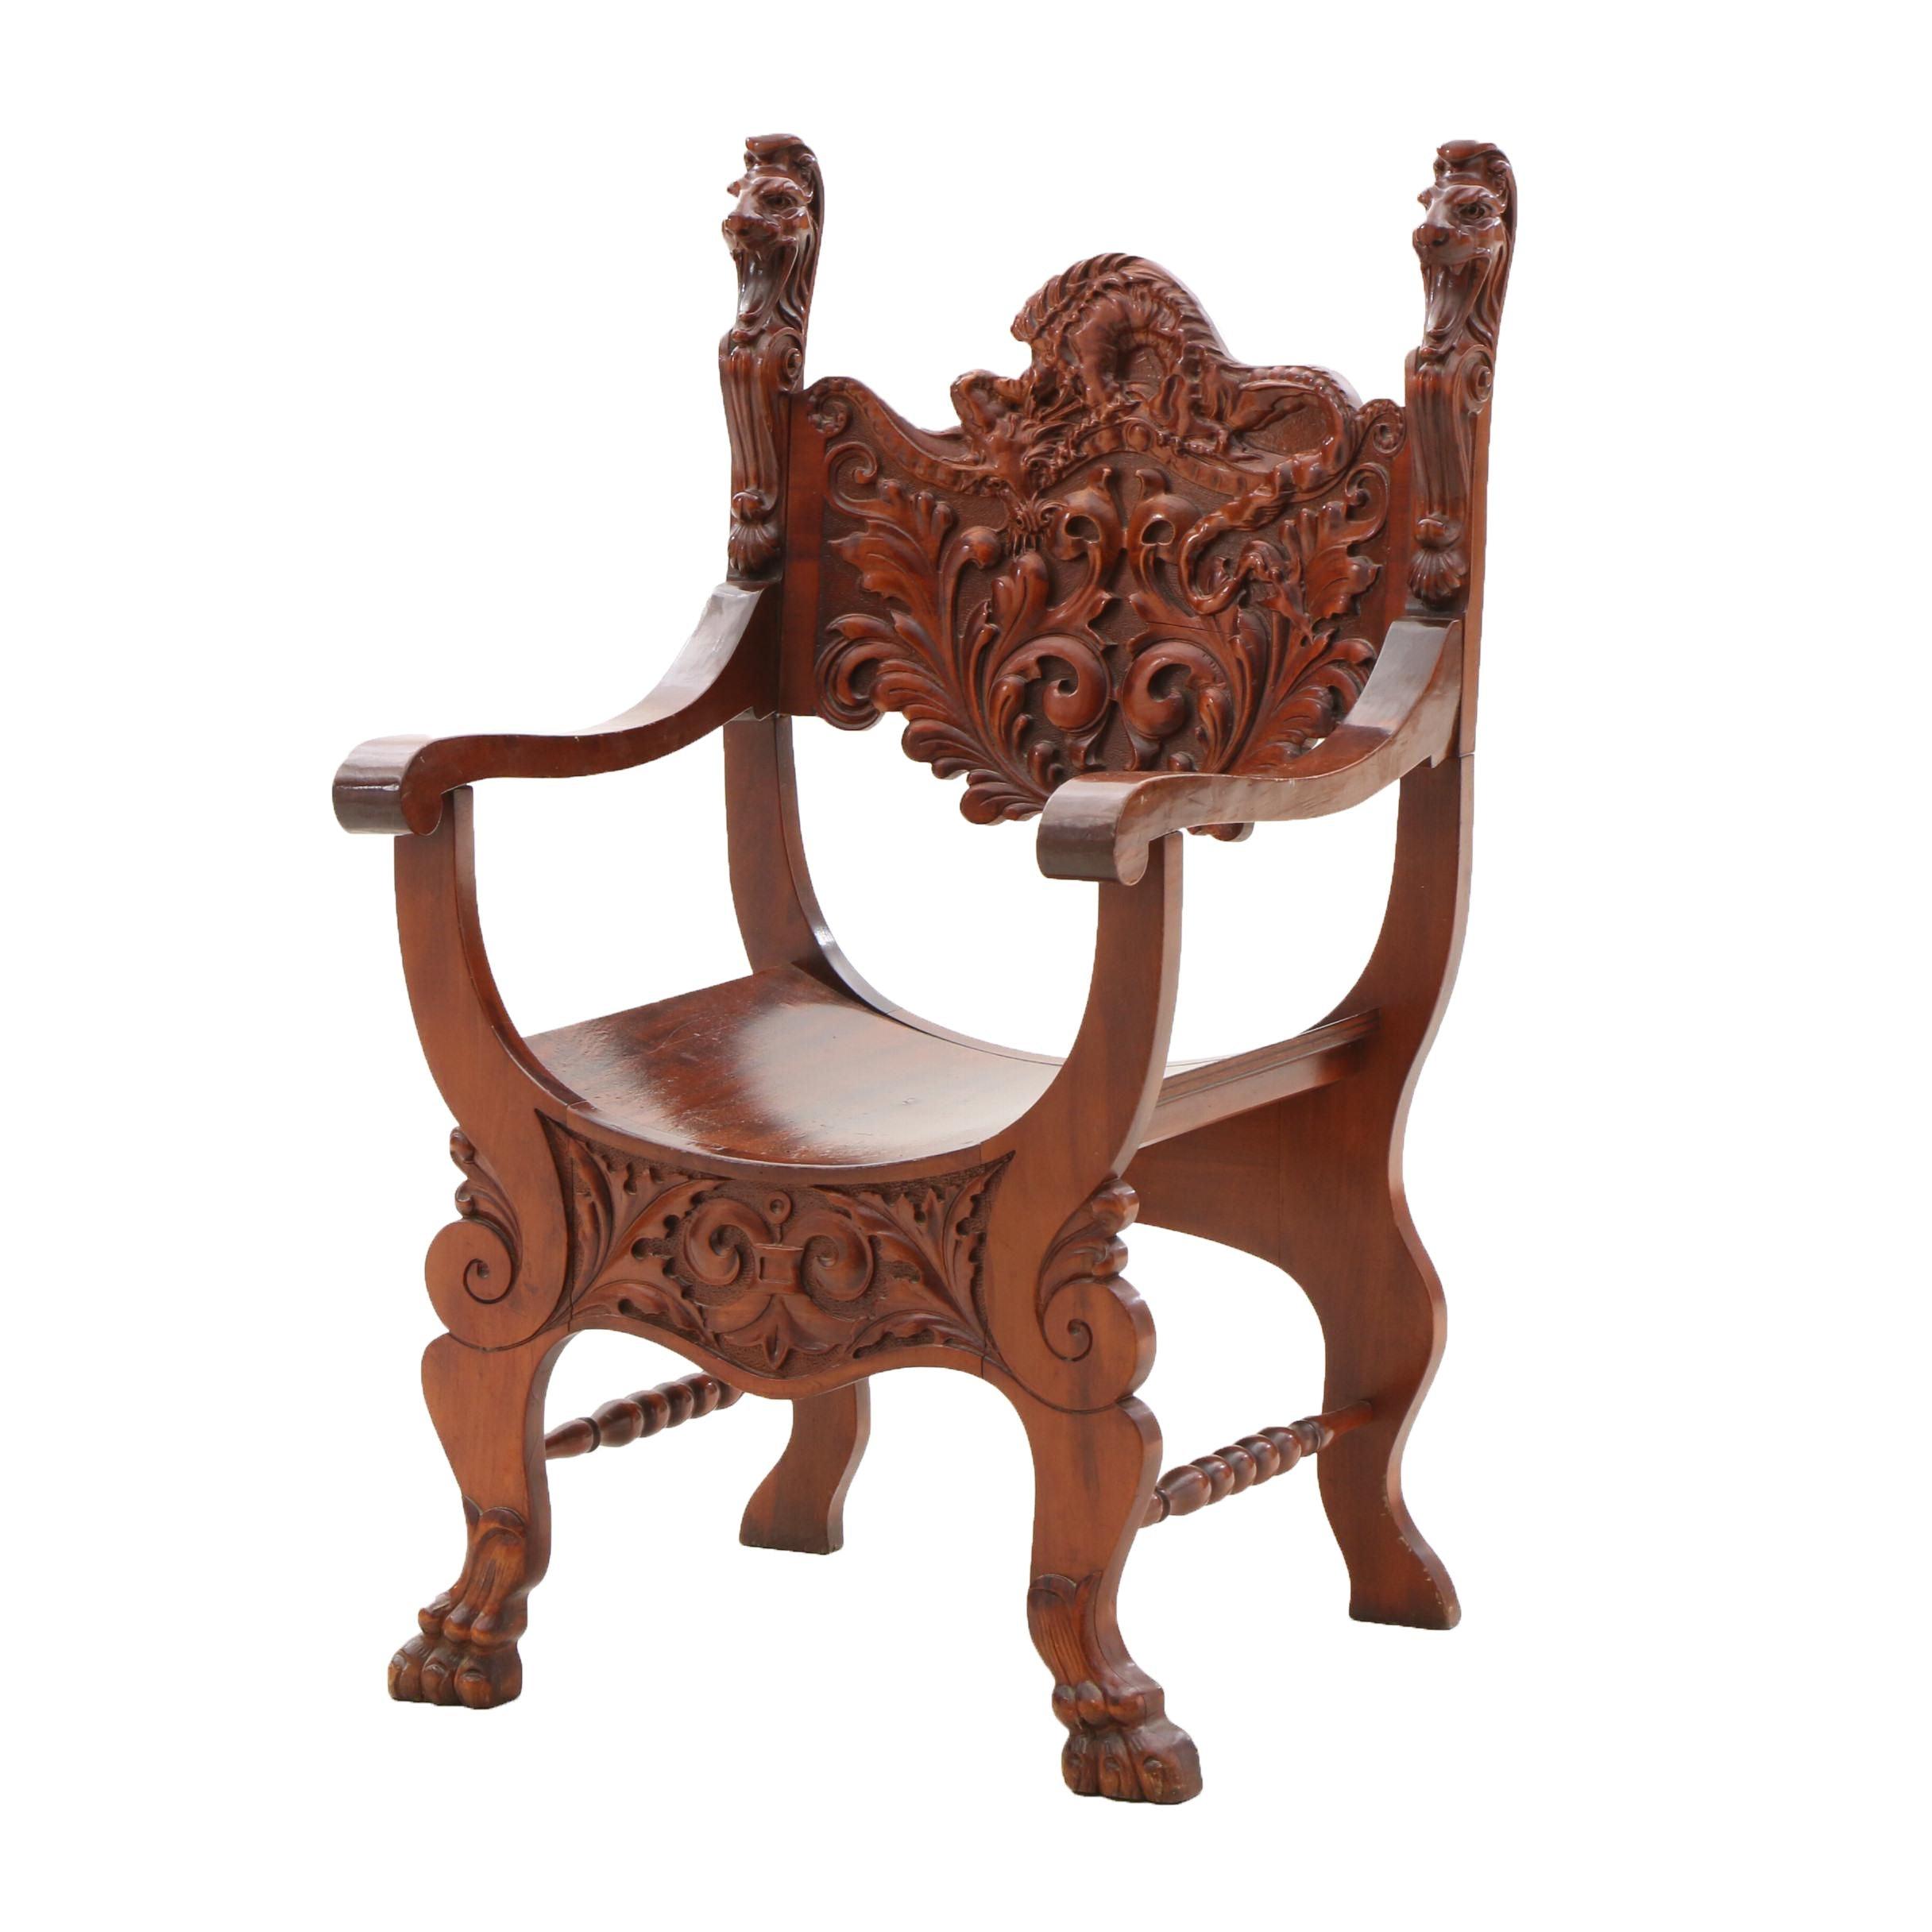 Ornately Carved Birch Arm Chair, Circa 1900